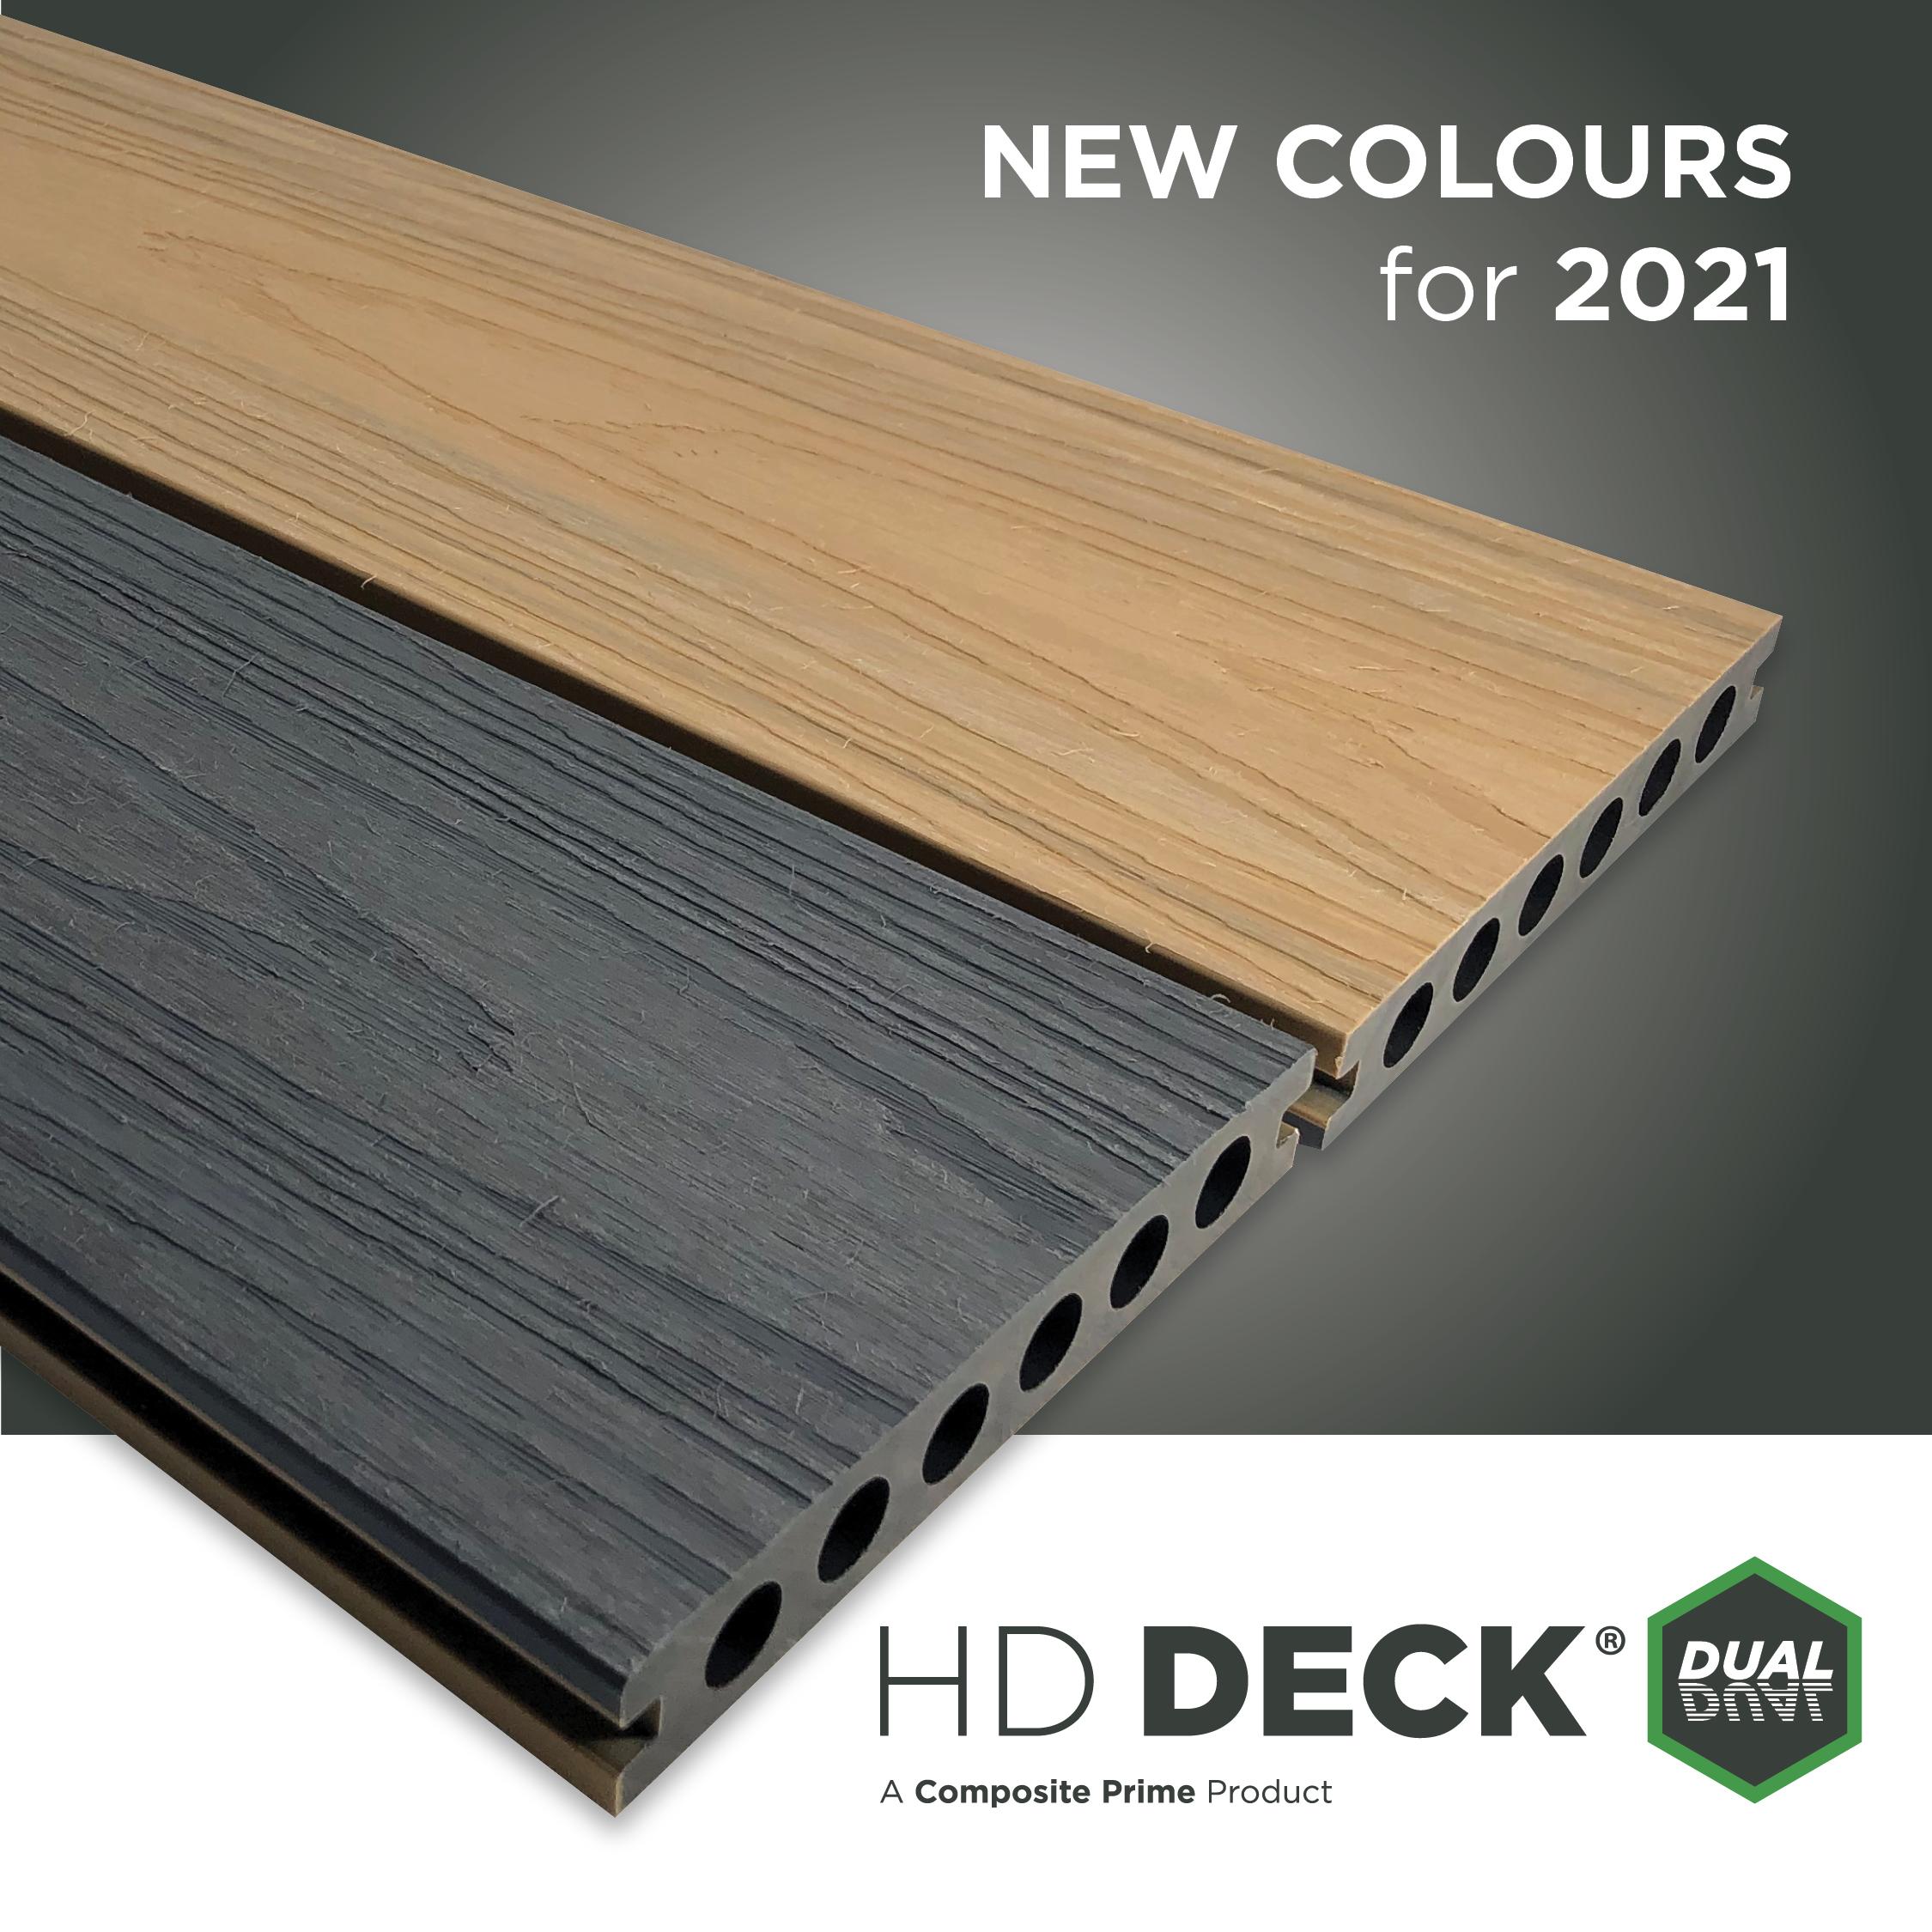 HD Deck Dual Natural Oak/Slate